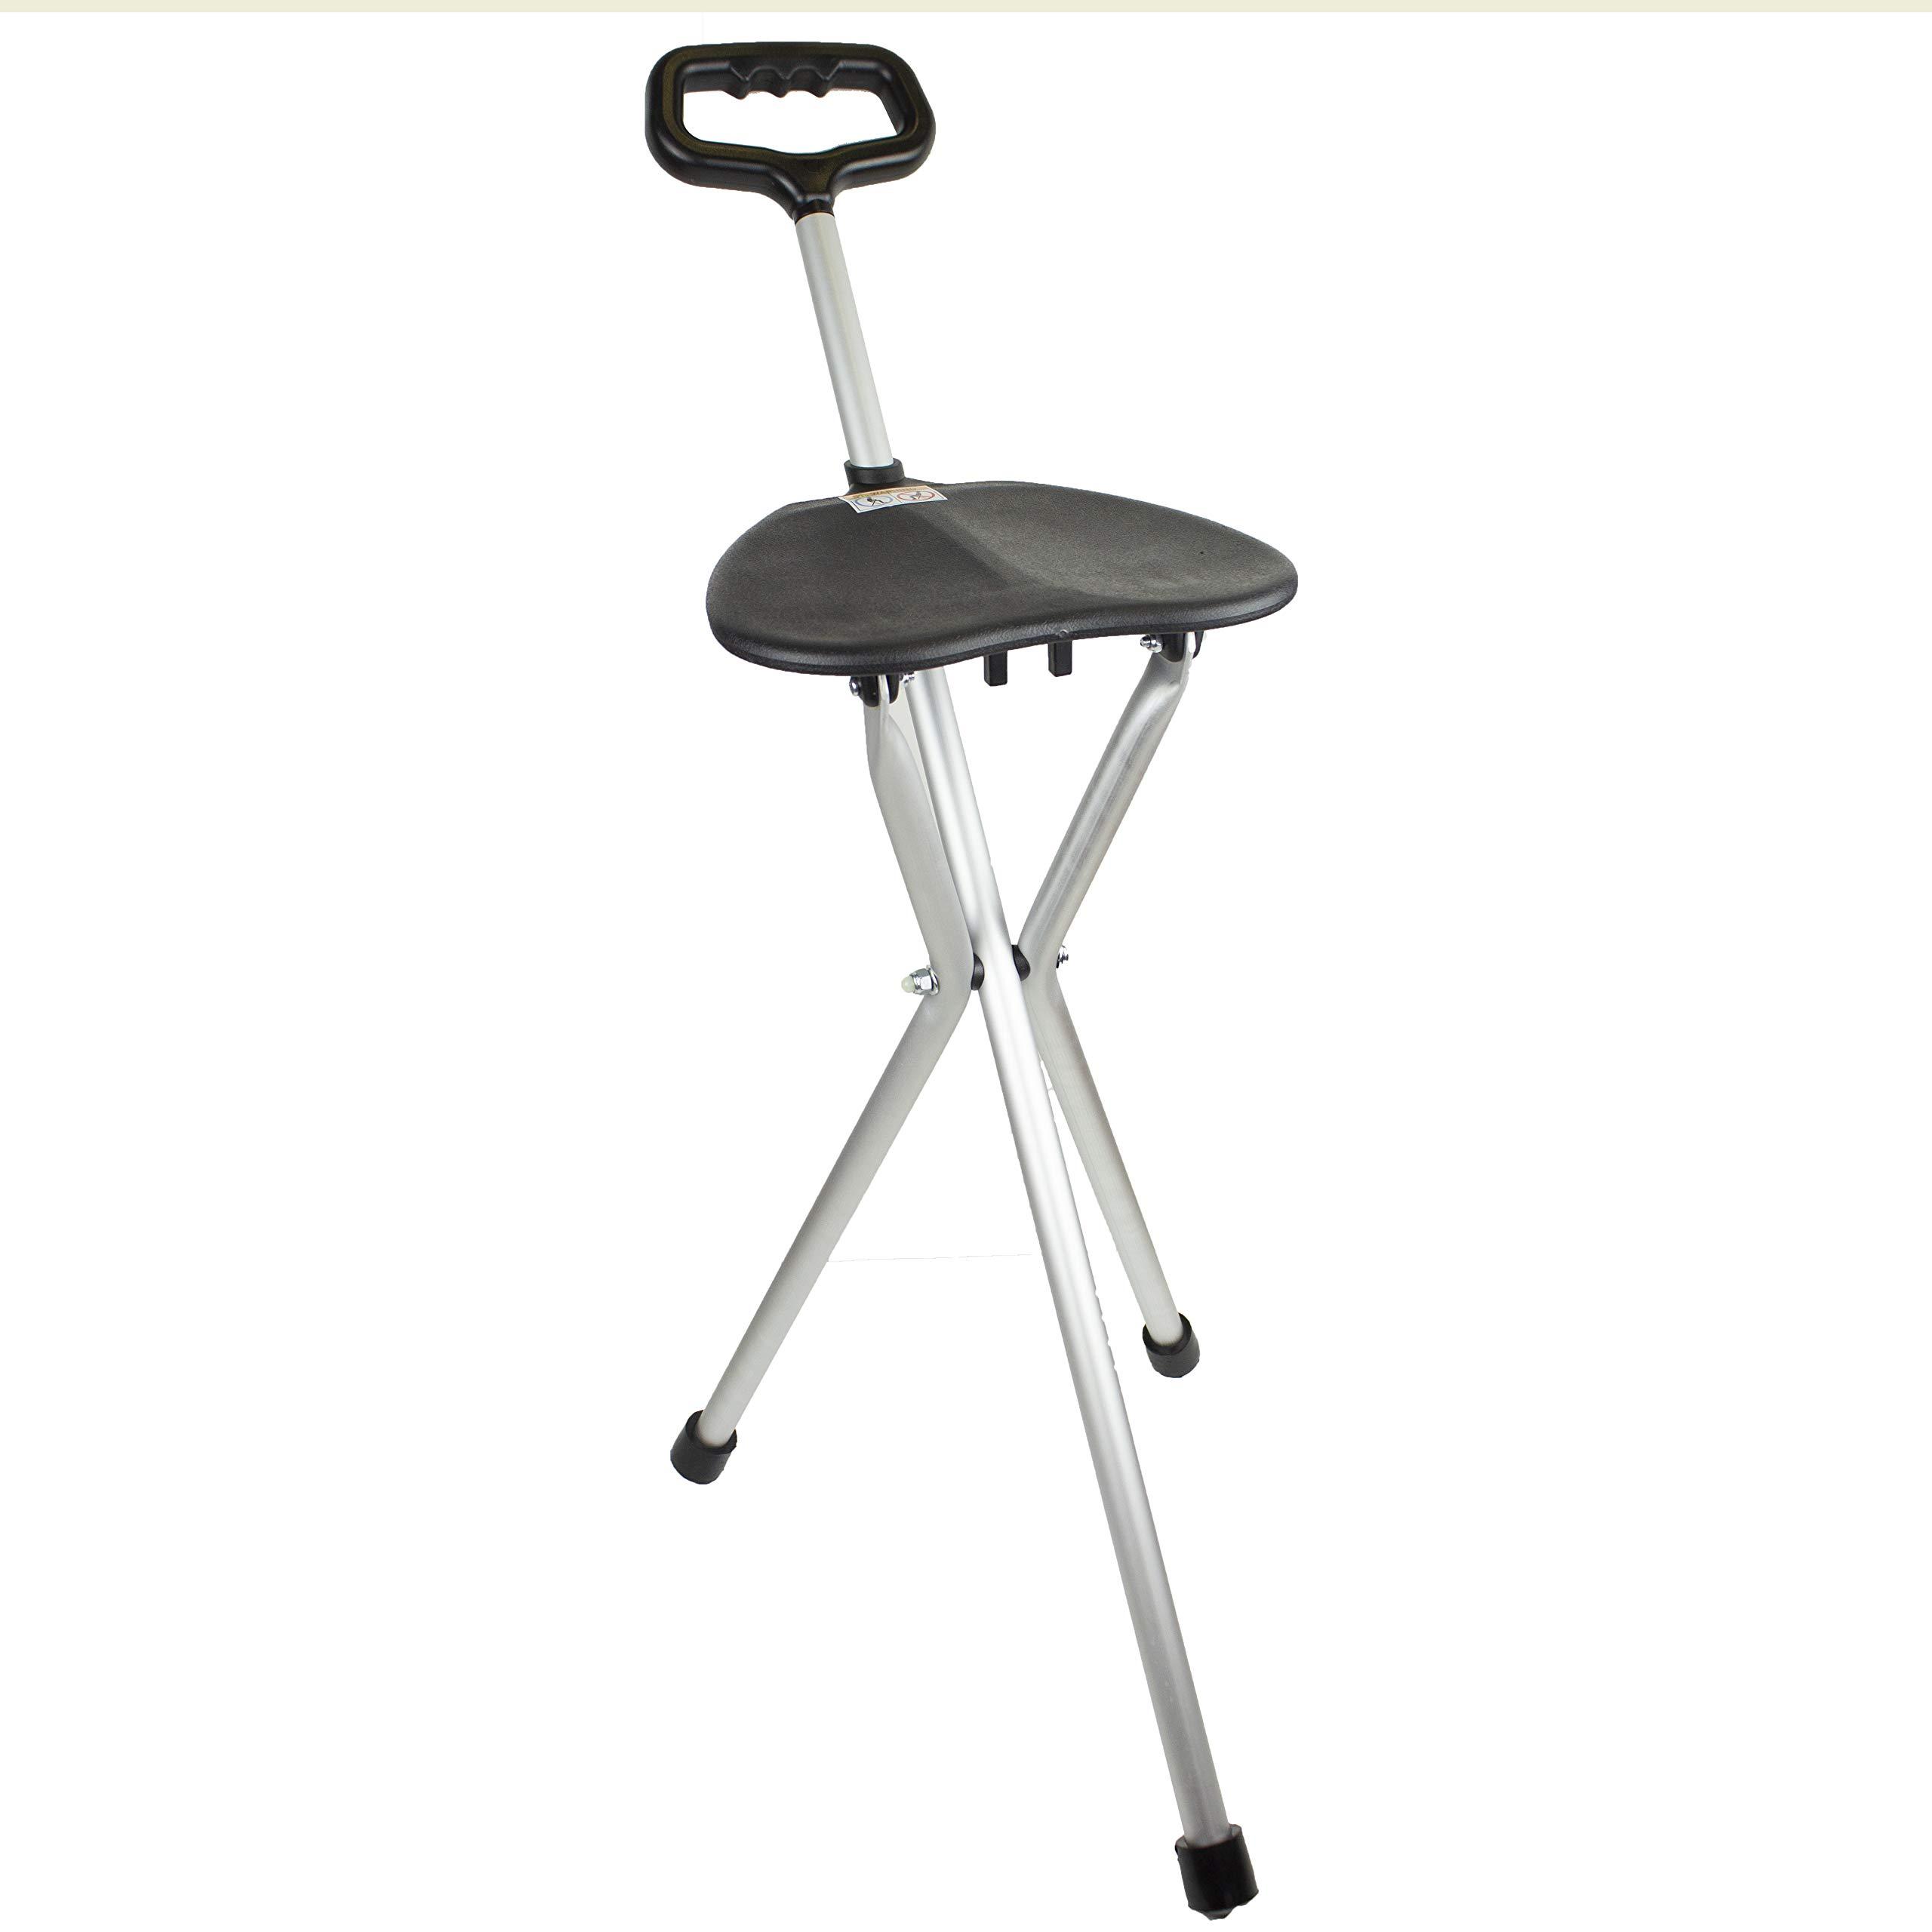 Bastón de aluminio con asiento plegable product image